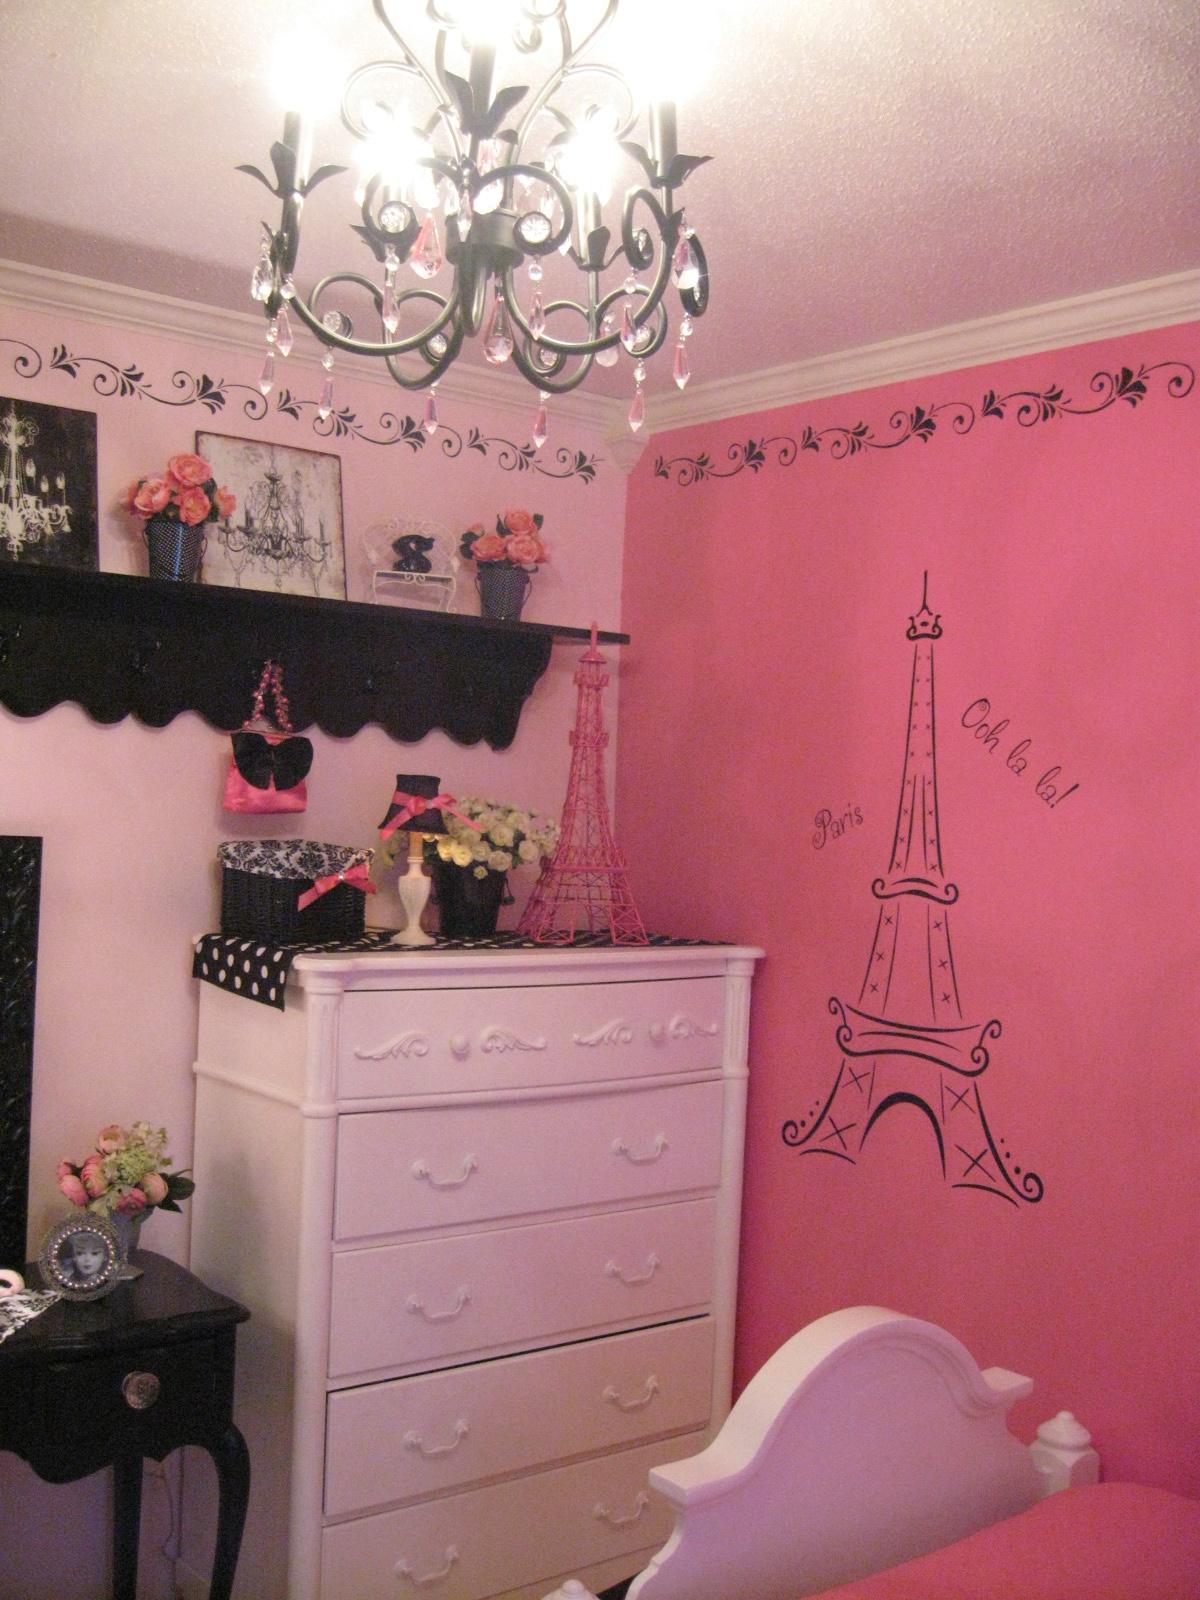 Diary Lifestyles Vintage Barbie Parisian Room